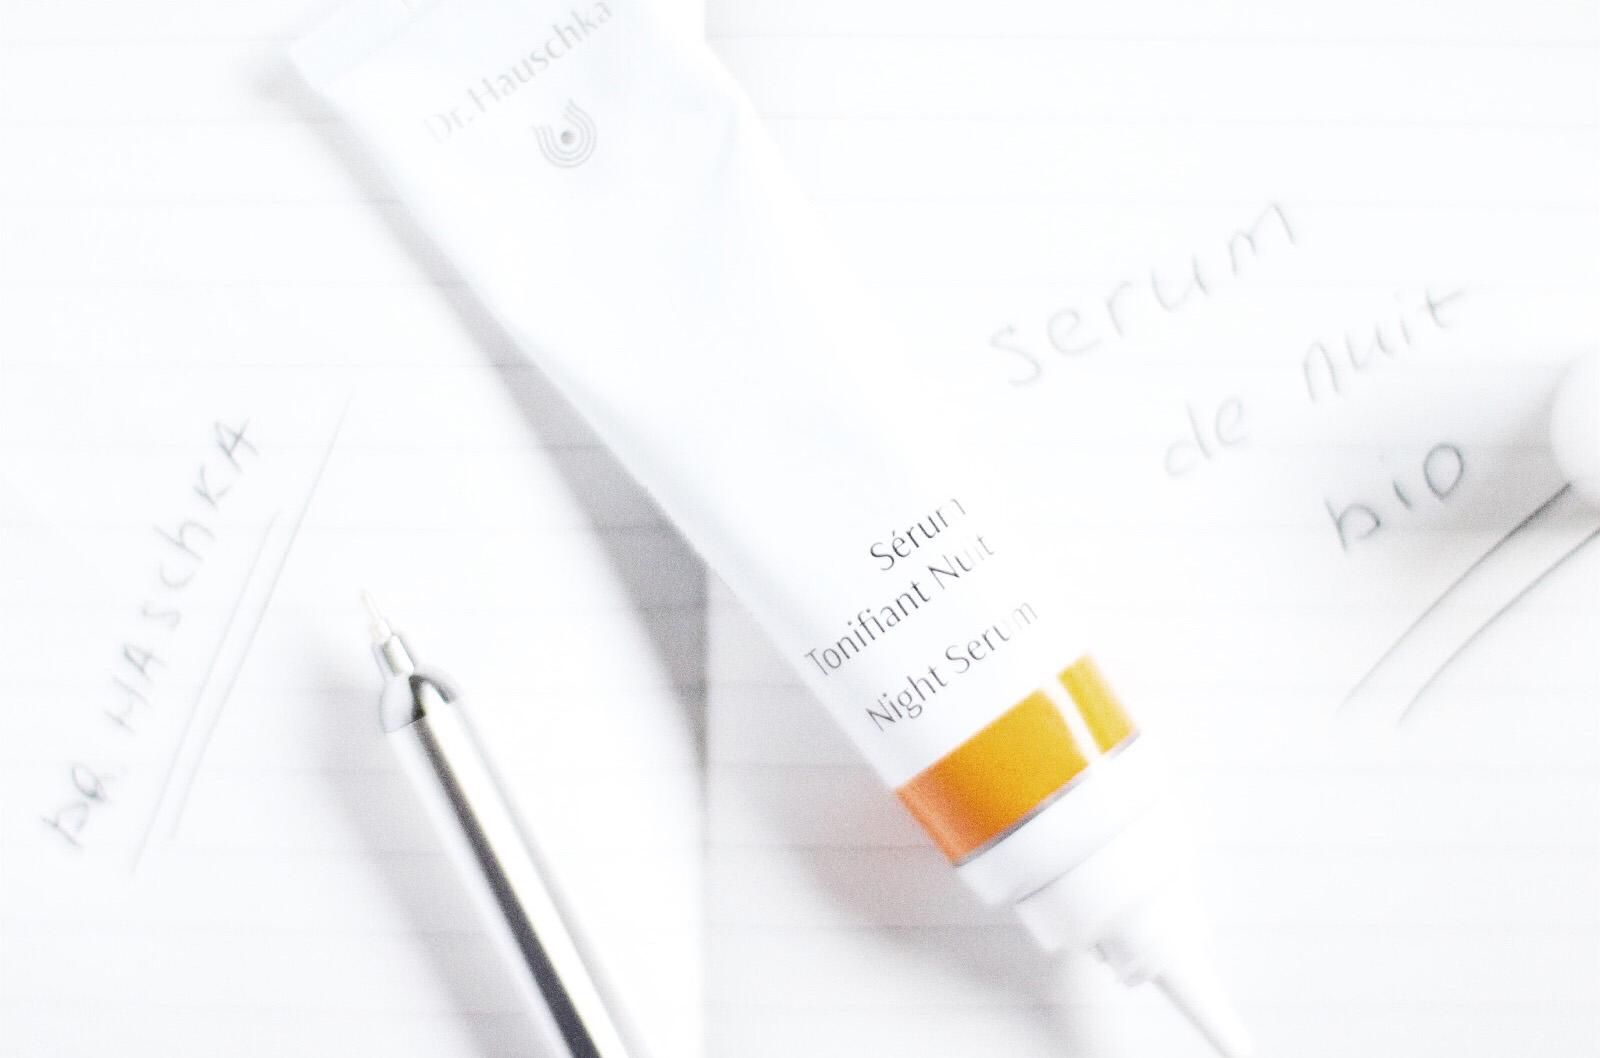 dr hauschka serum tonifiant nuit avis test